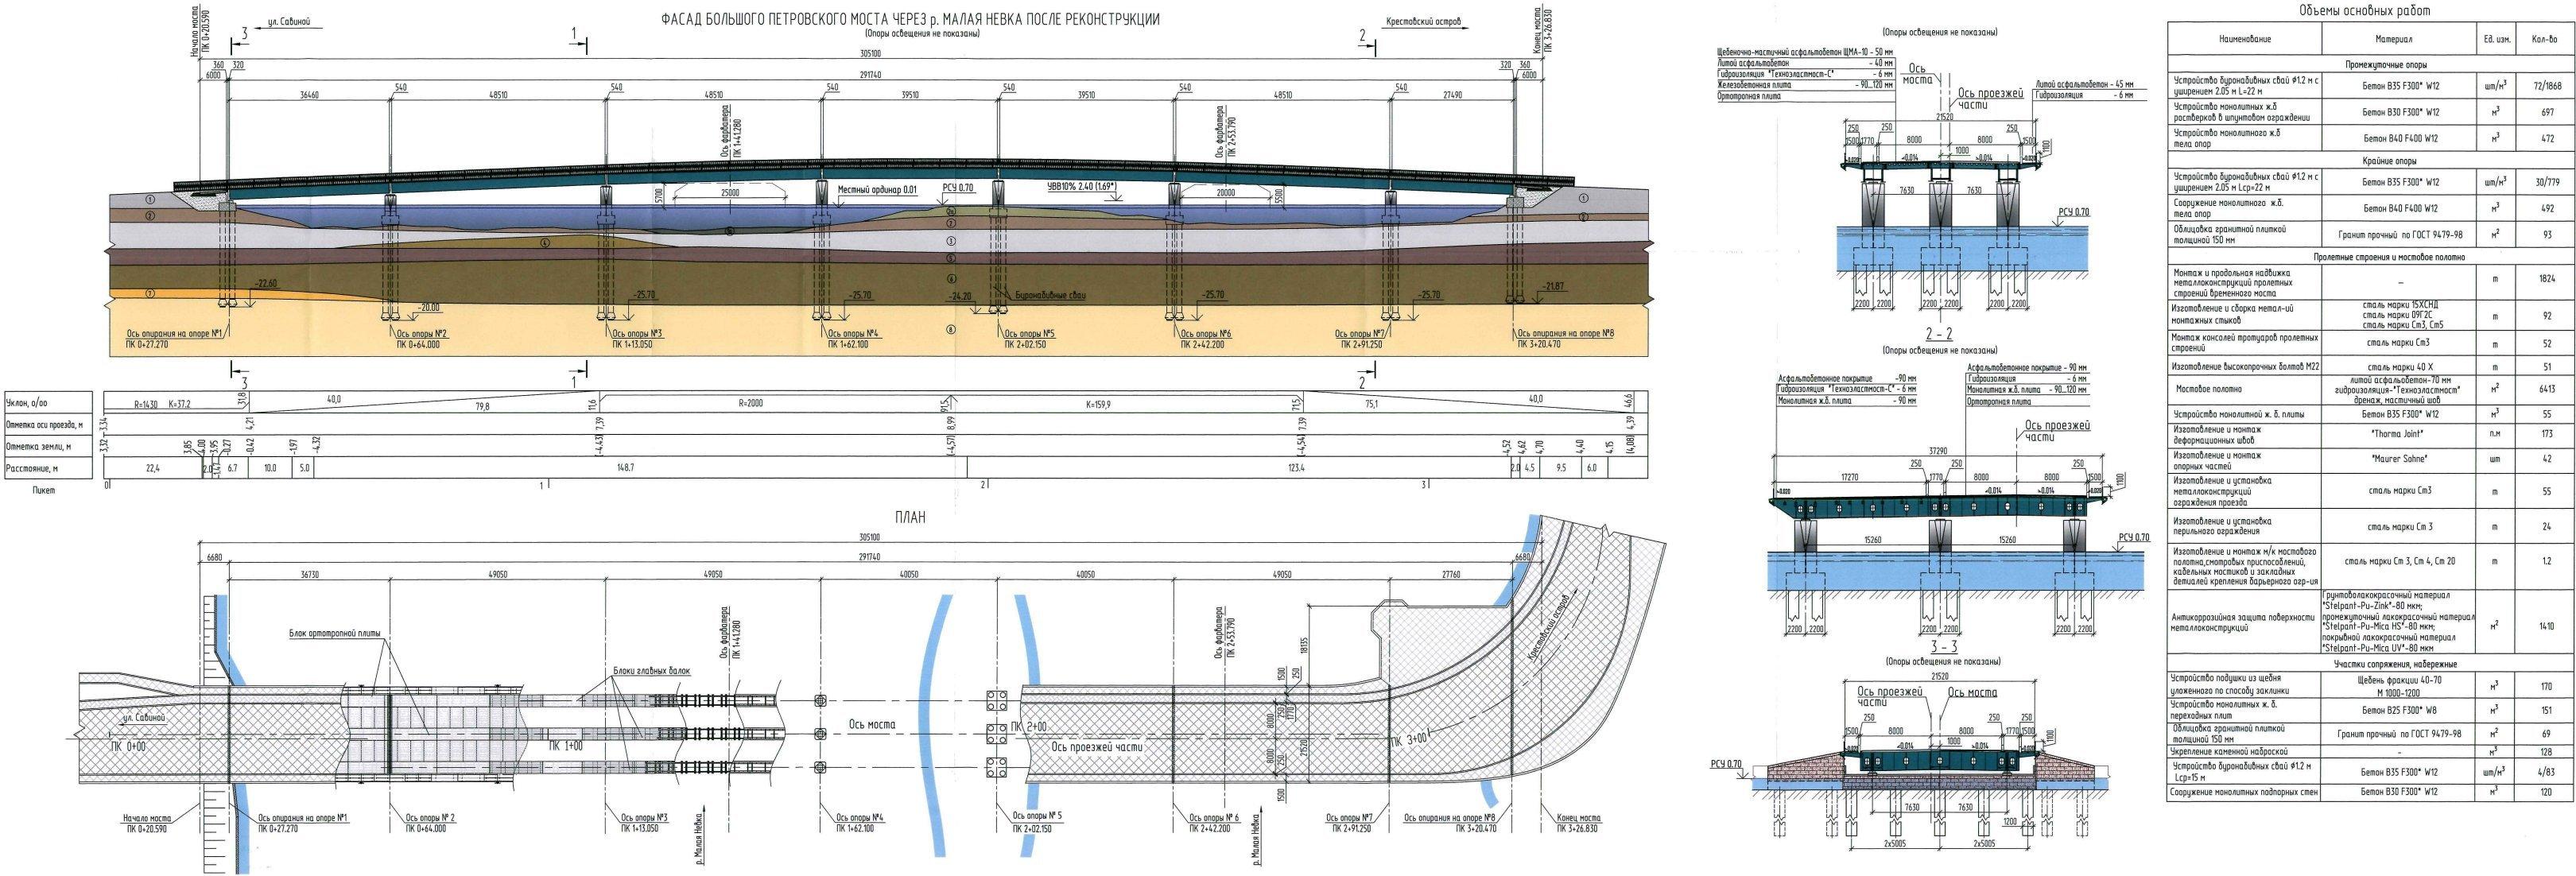 Схема опор керченского моста